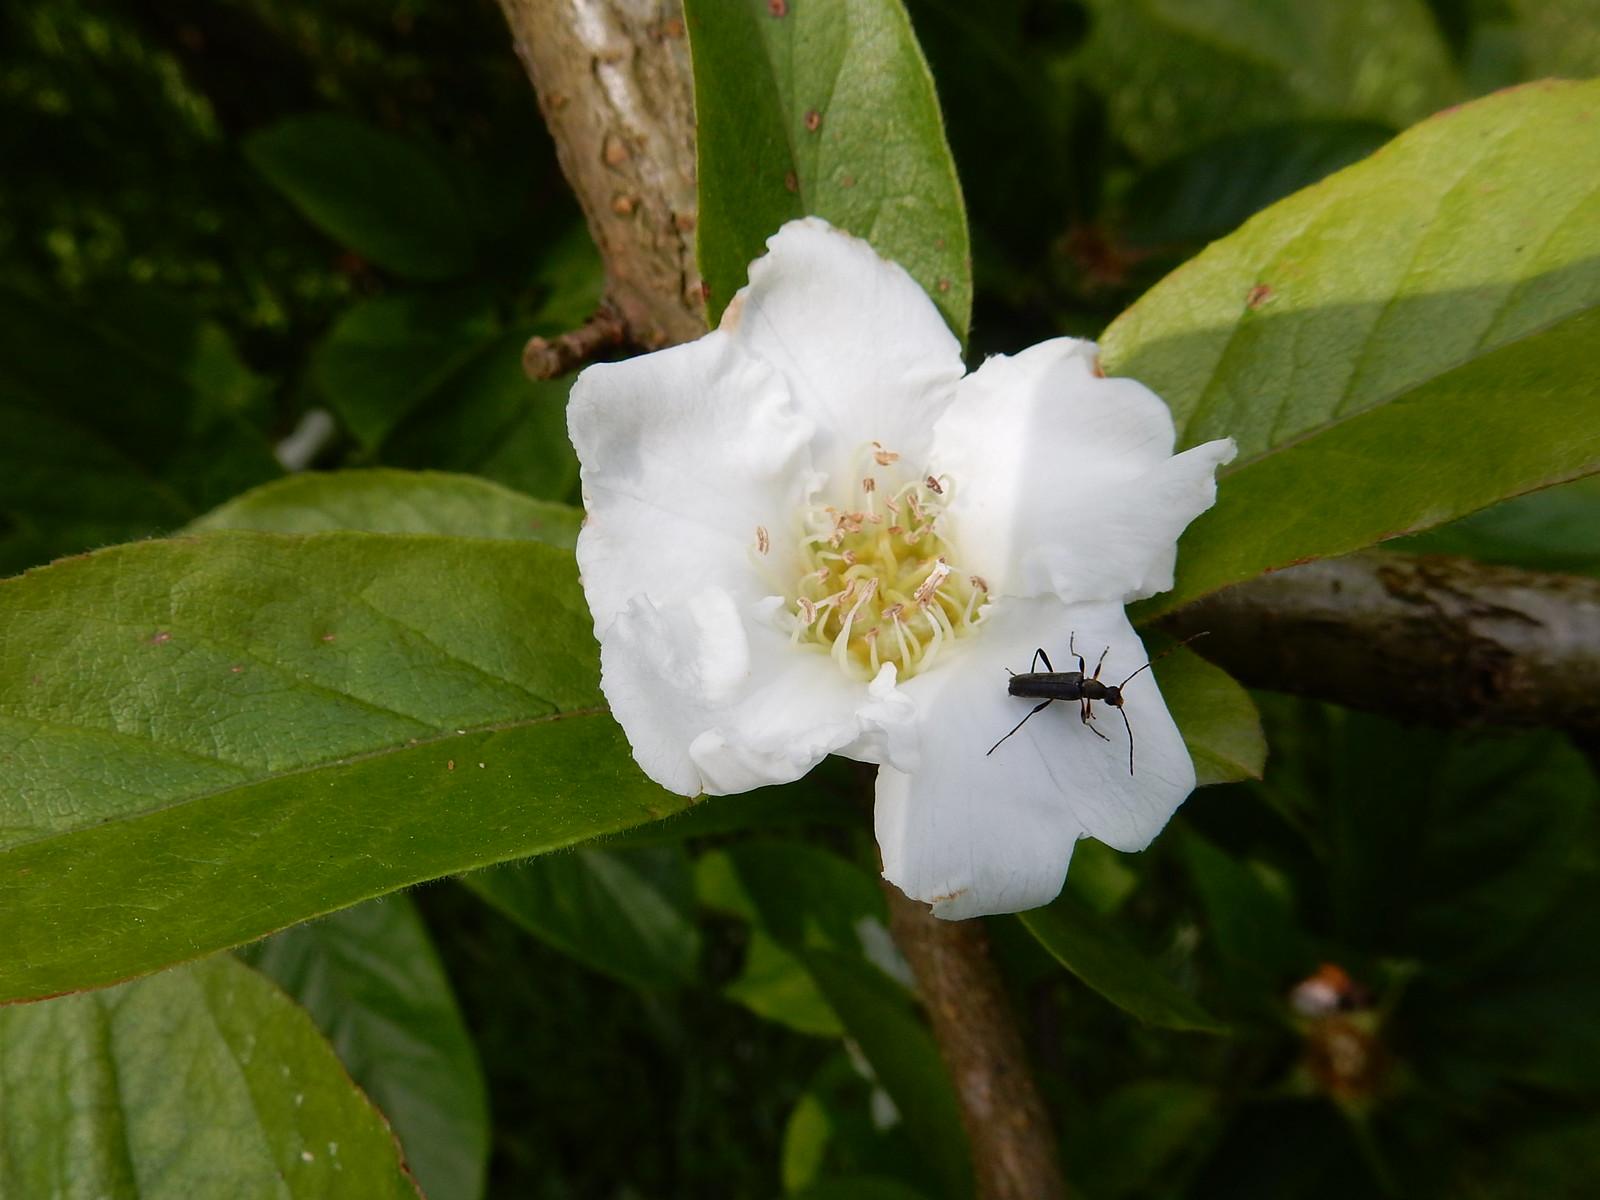 Medlar blossom Winkworth Arboretum, Milford to Godalming